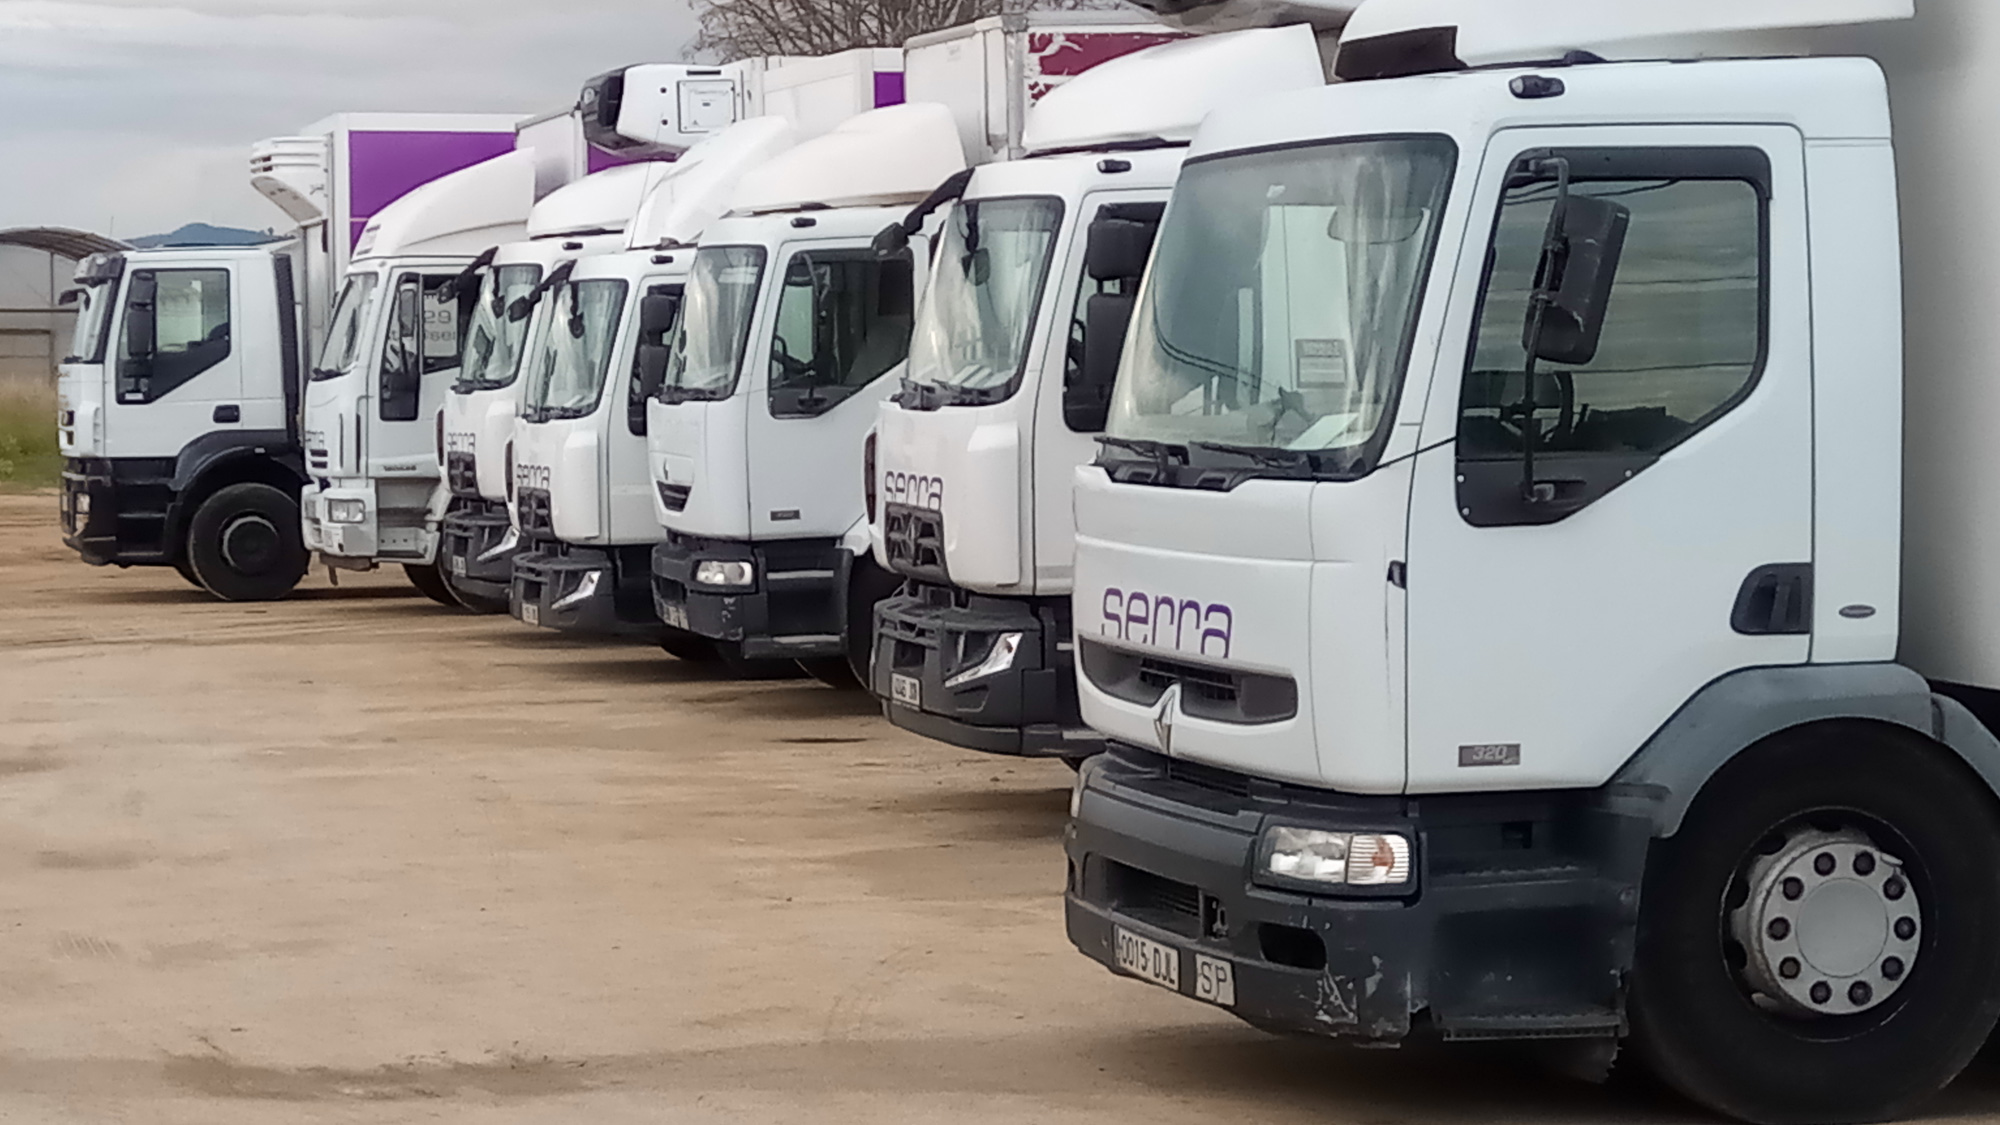 transports-serra-camions